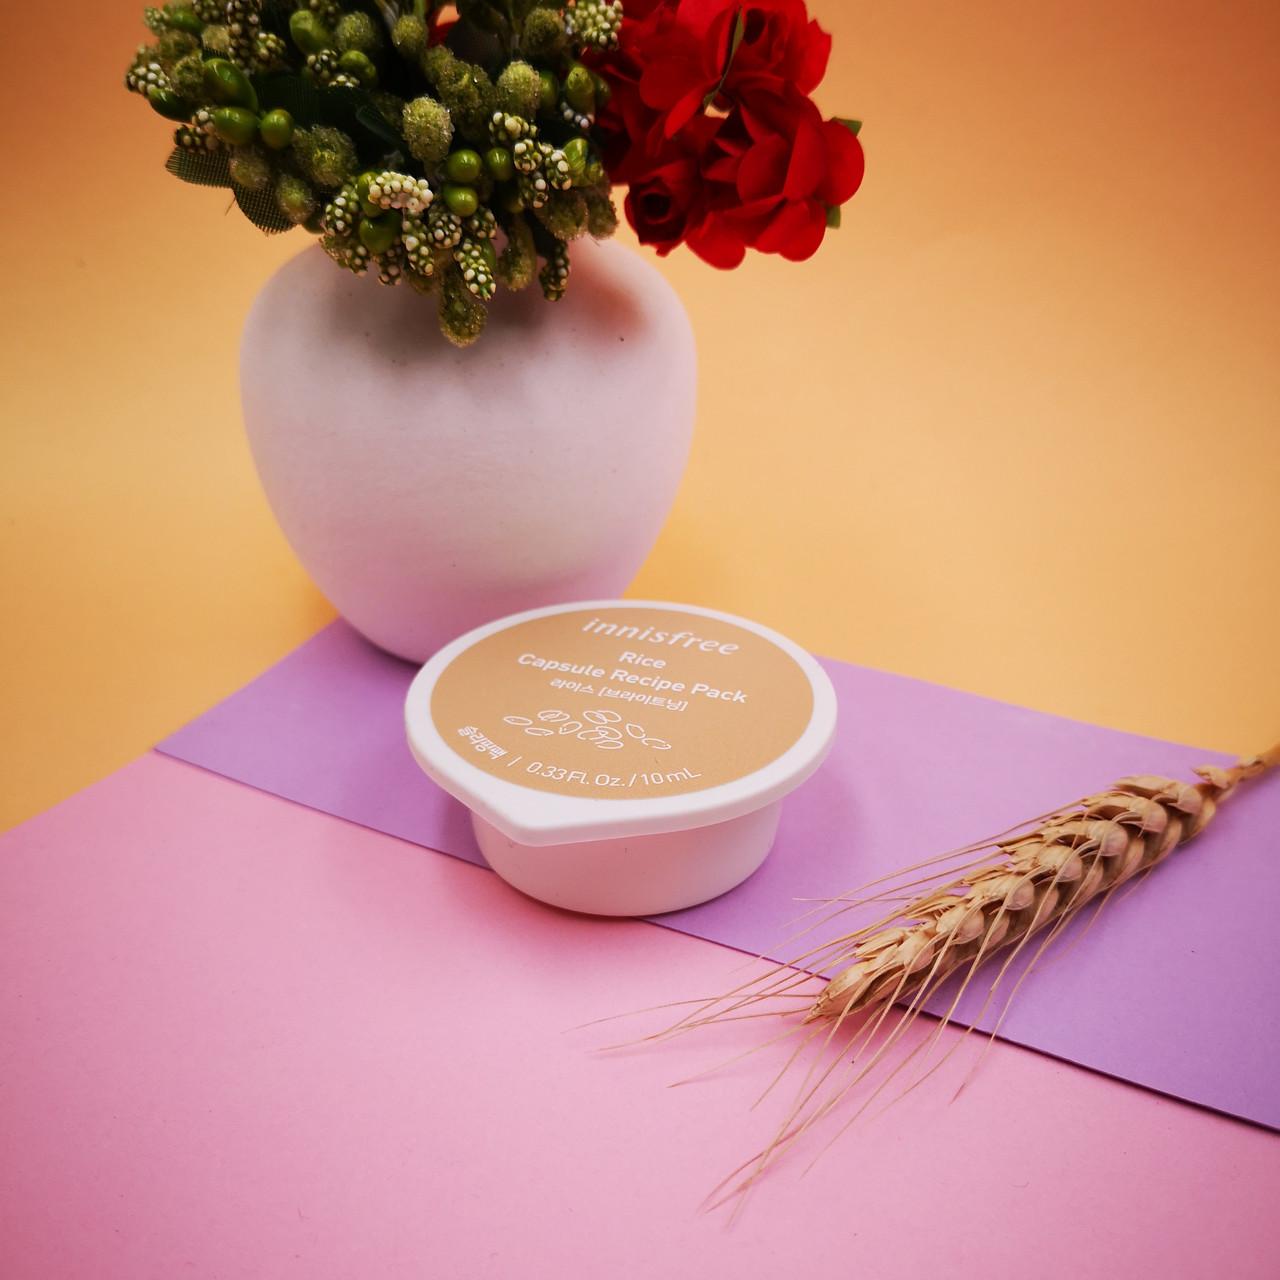 Innisfree Ночная маска для лица с экстрактом риса в капсуле (осветление) Capsule Recipe Pack-Rice